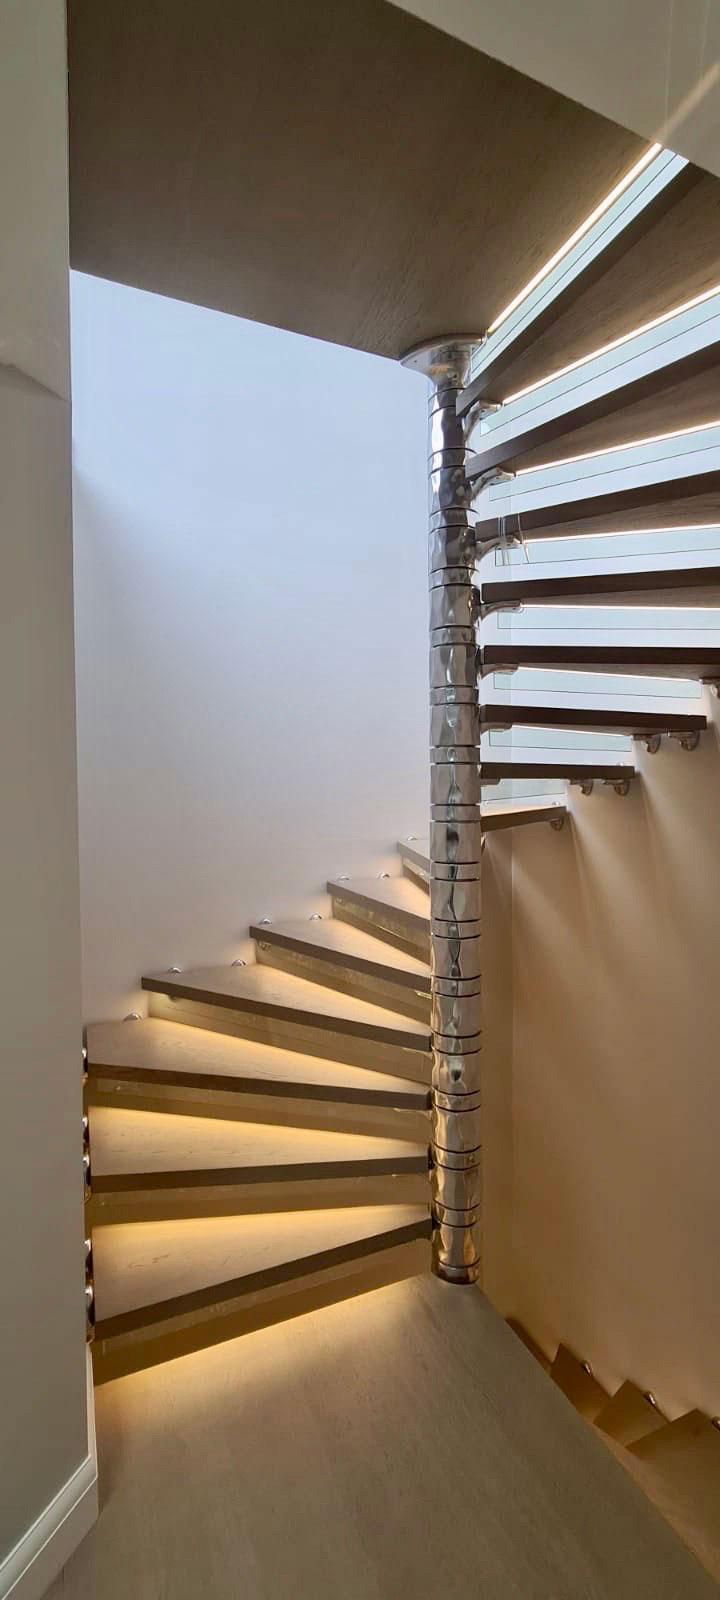 laverton5 Laverton Staircase